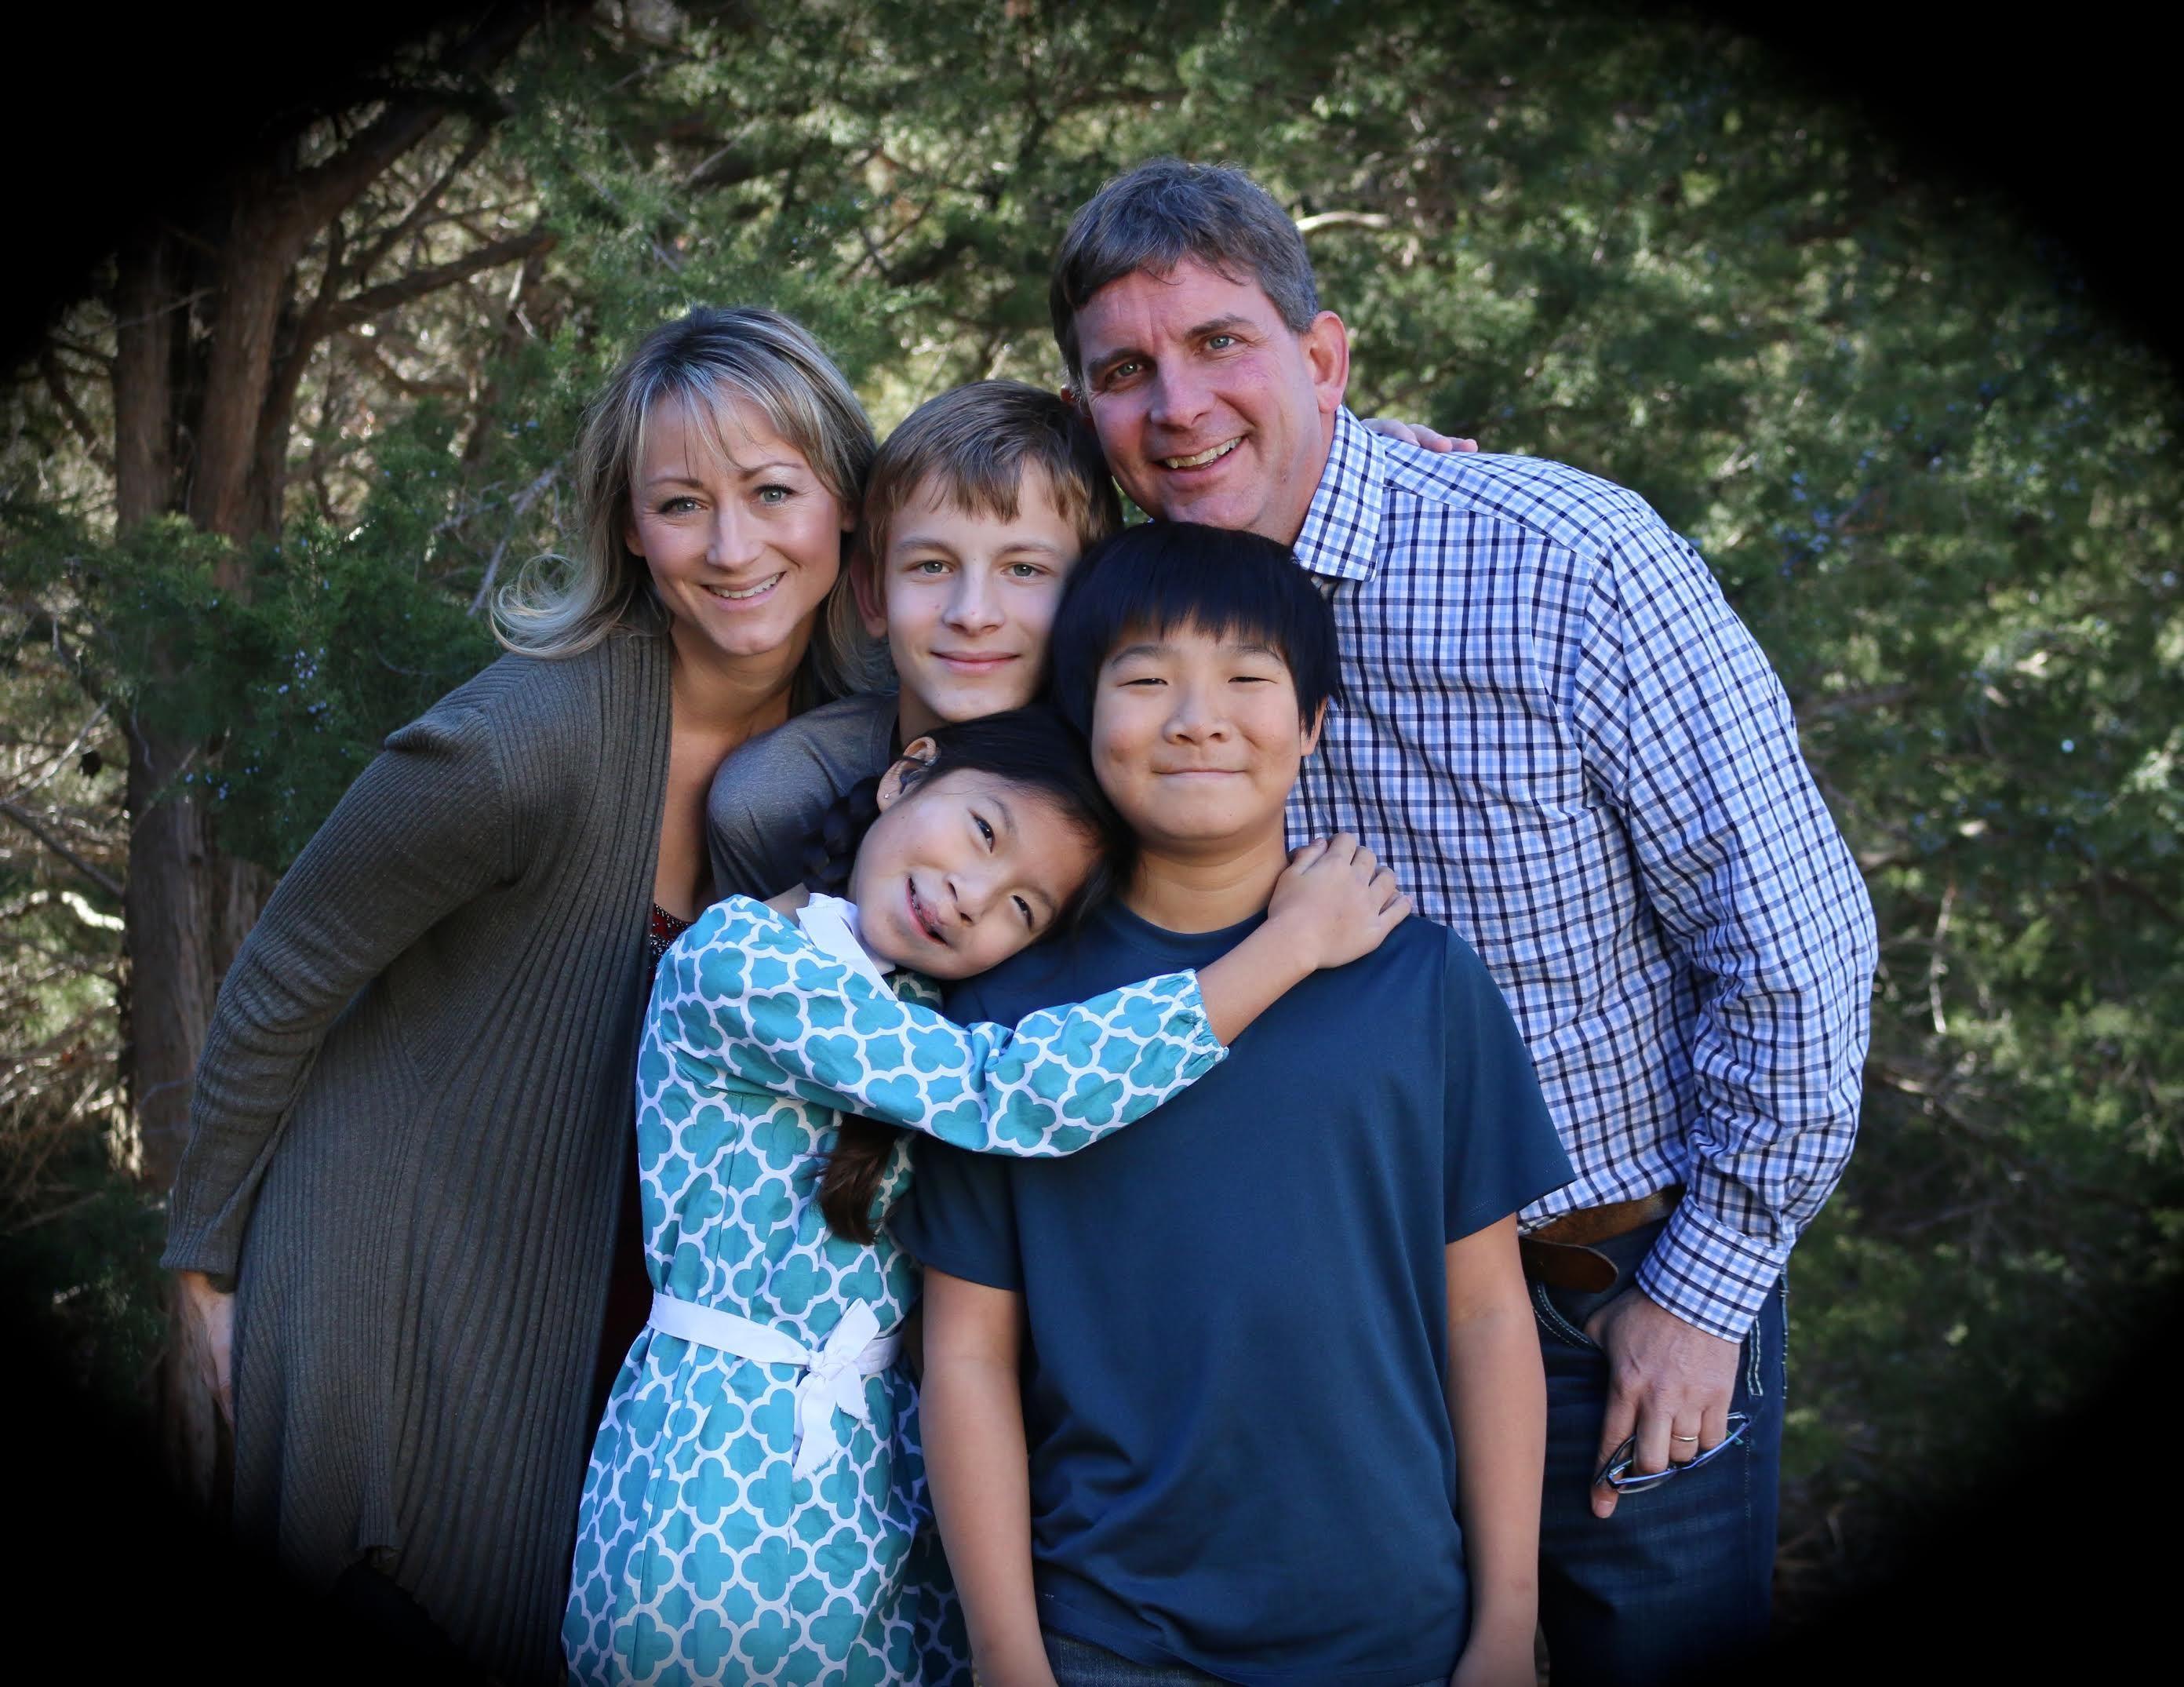 Trent Richmond family photo